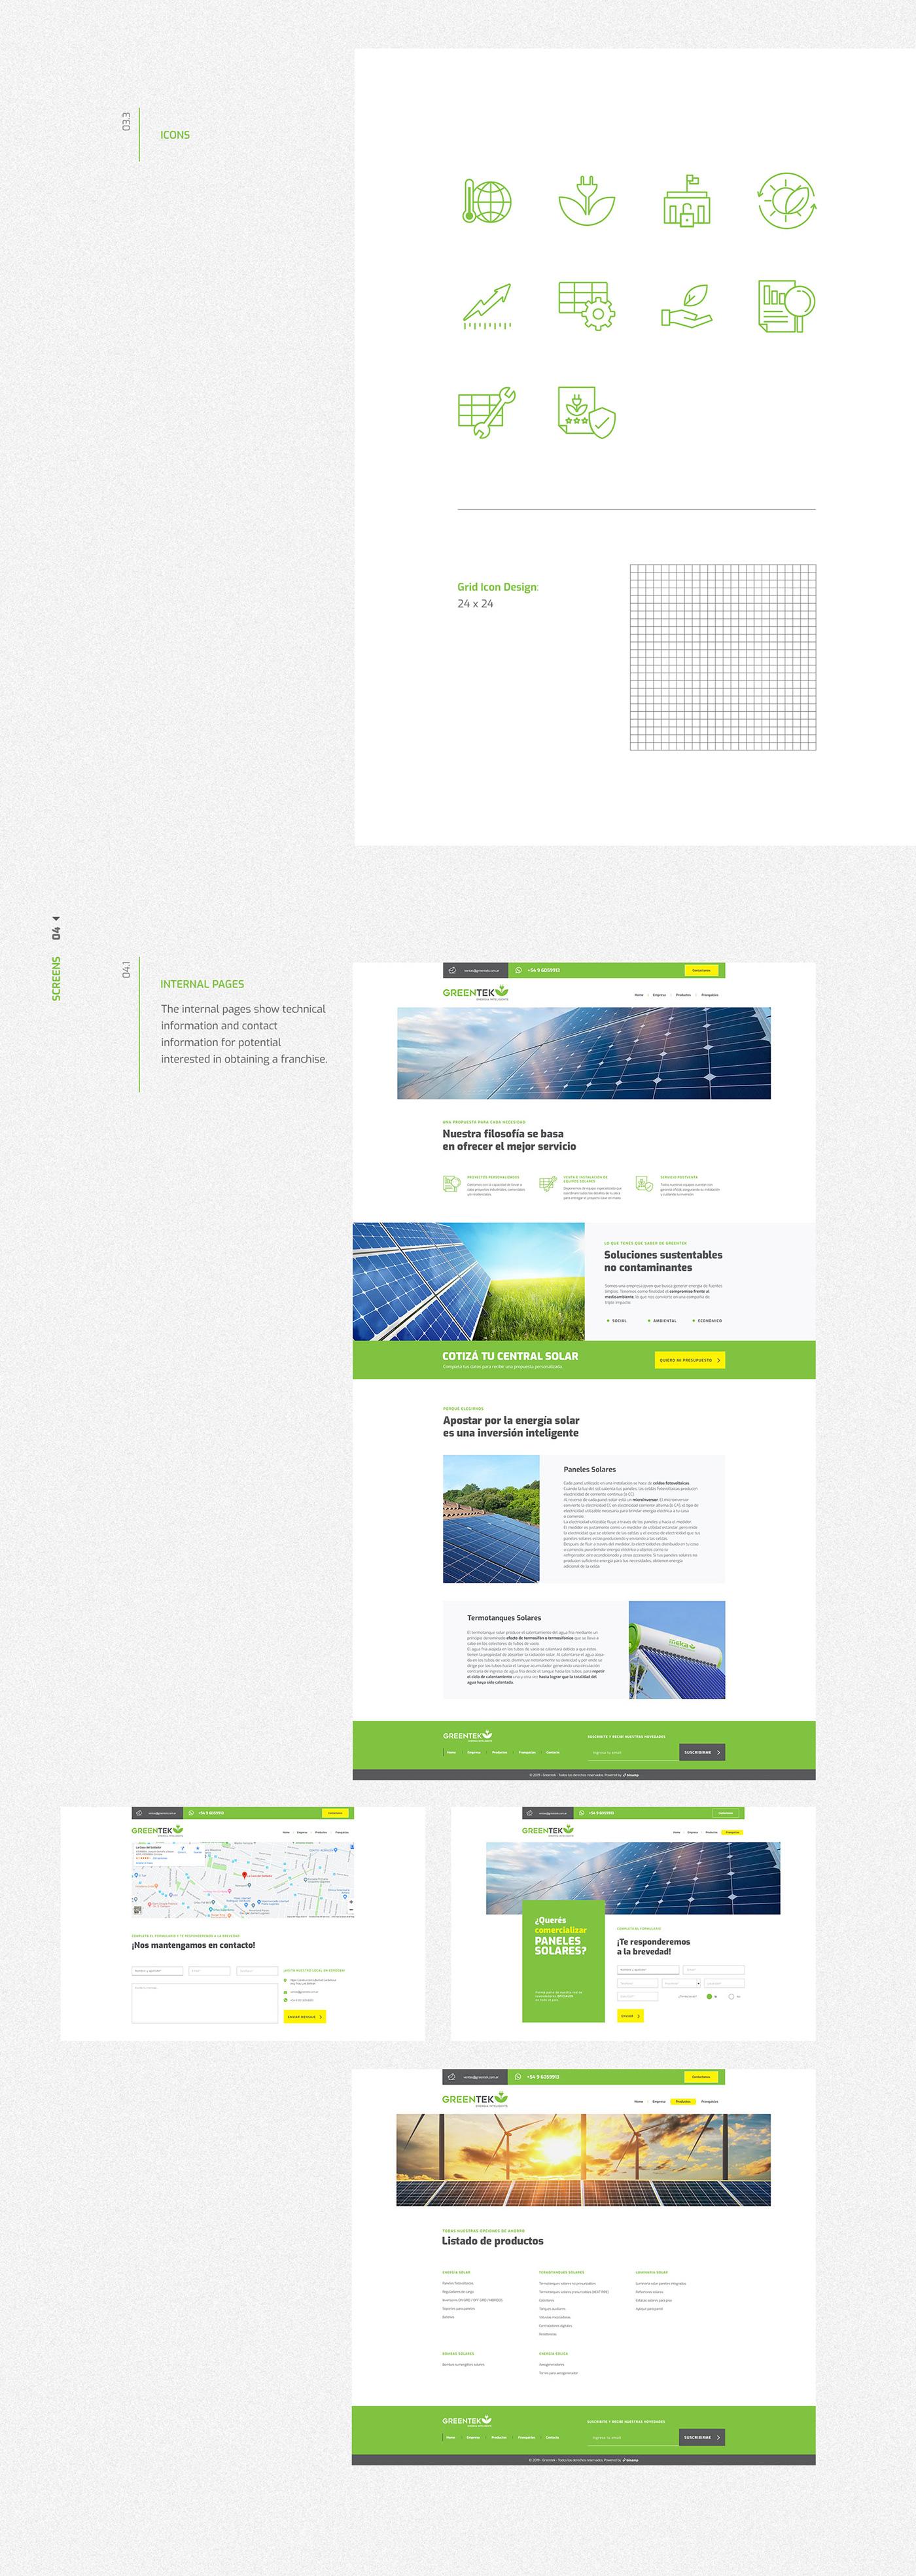 design,development,ui ux,UI,ux,web site,Web,diseño gráfico